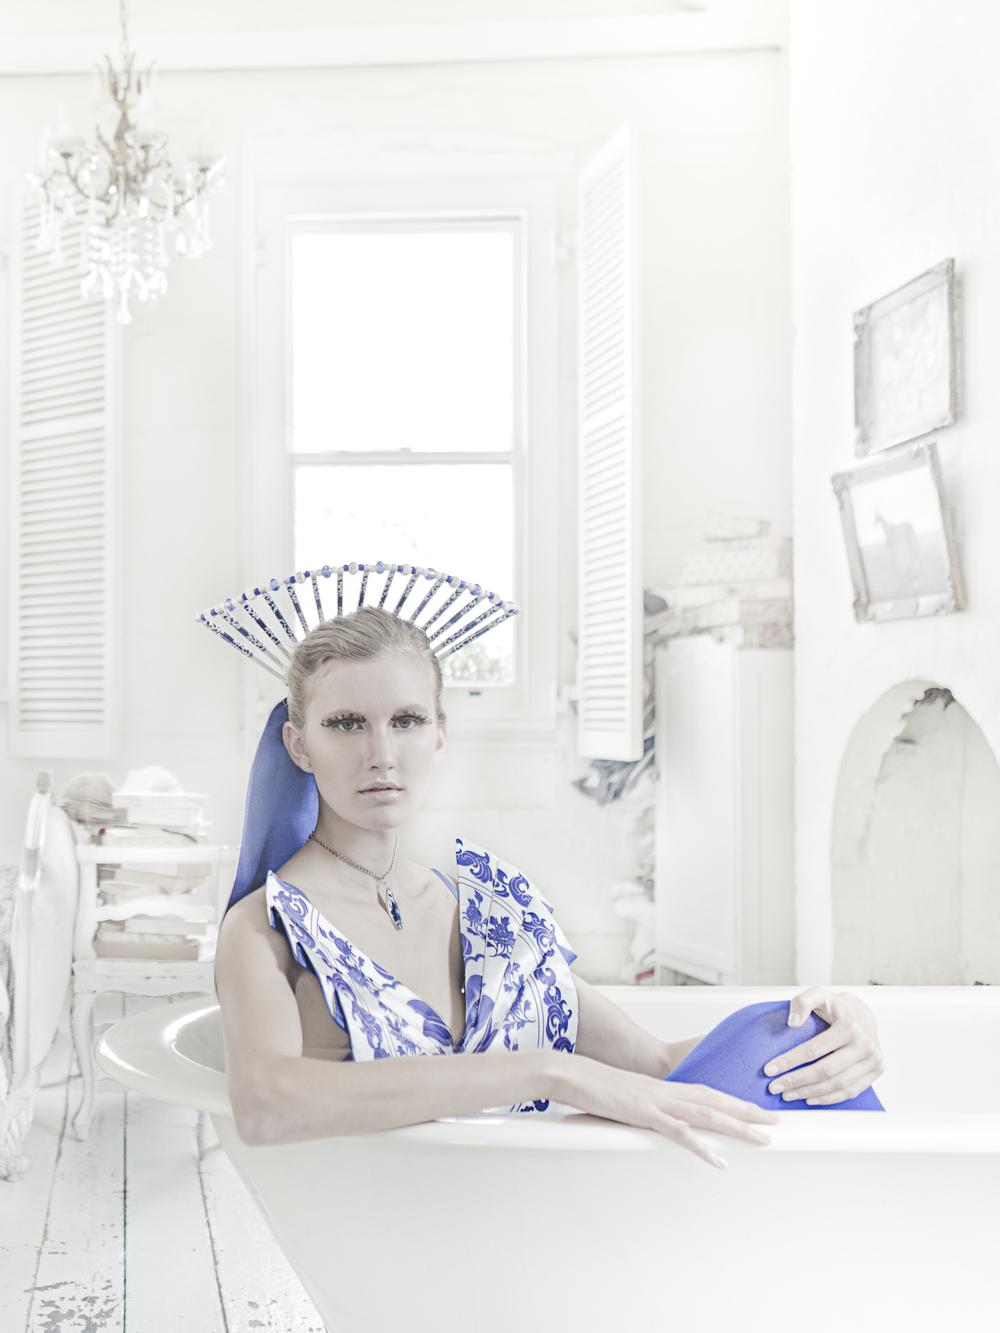 Vikk_Shayen_portfolio_cindyZ_porcelain_wear_9438-Edit-2-2.jpg